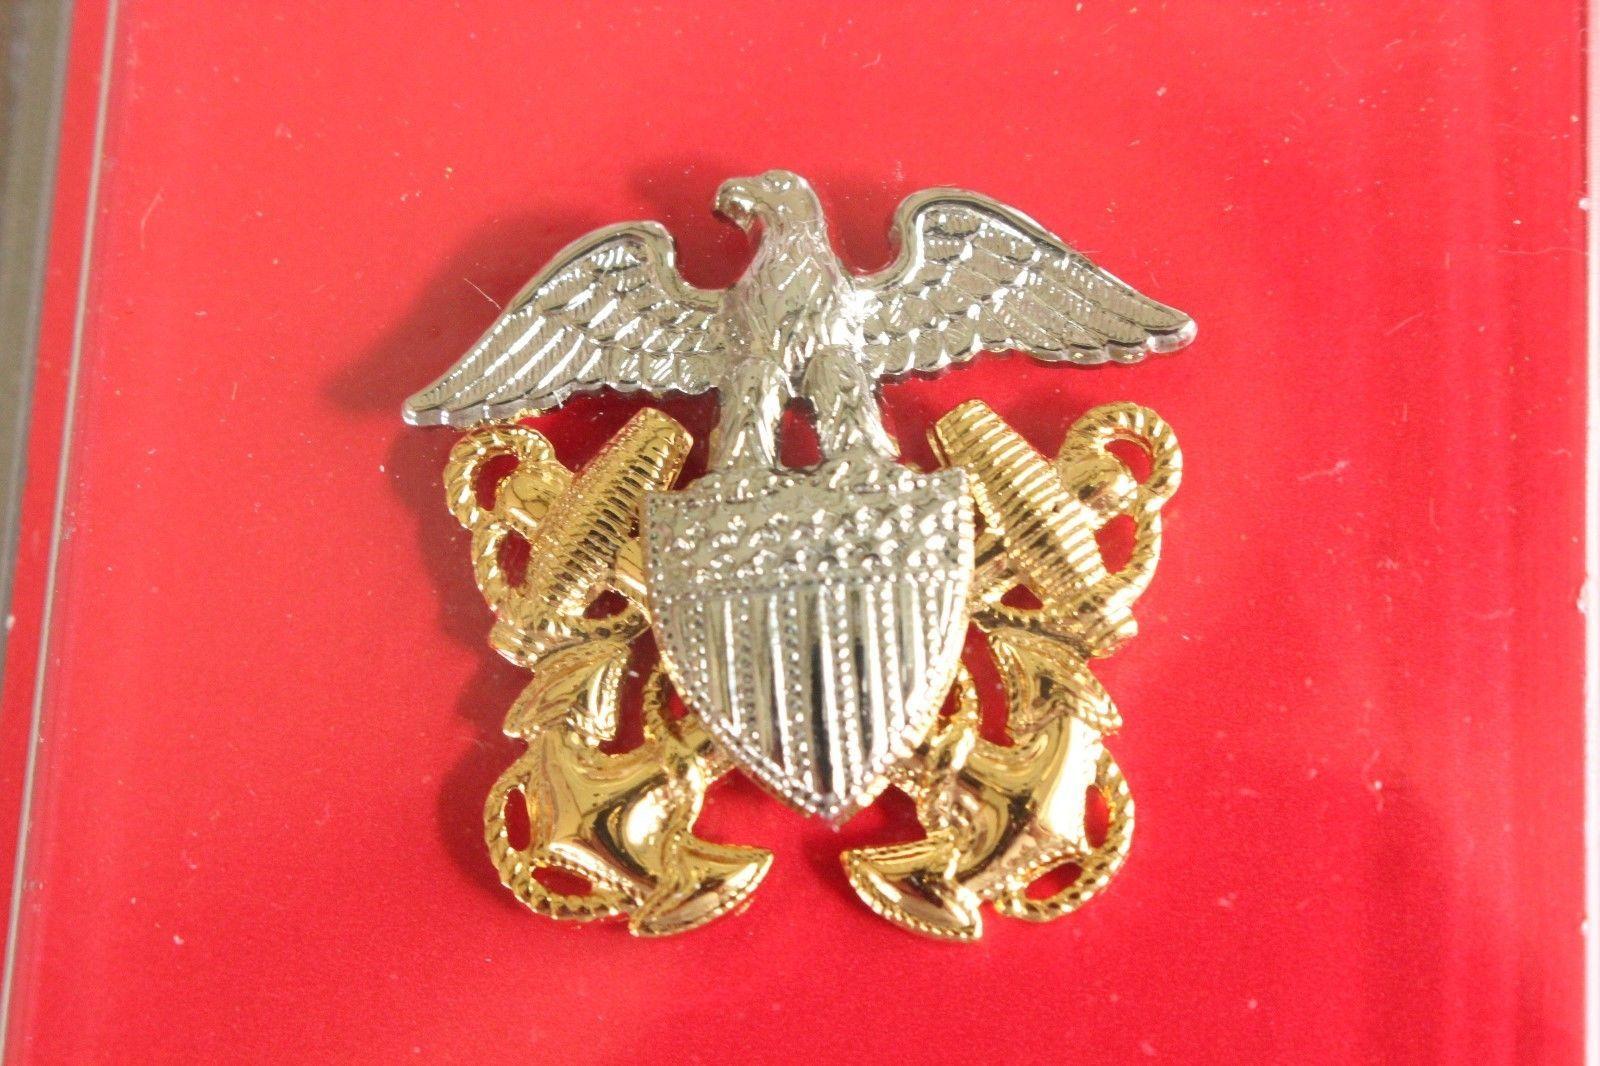 USN US NAVY O-7 RDML RANK OFFICER GARRISON CAP BADGE & DEVICE REDUCED SIZE MINI